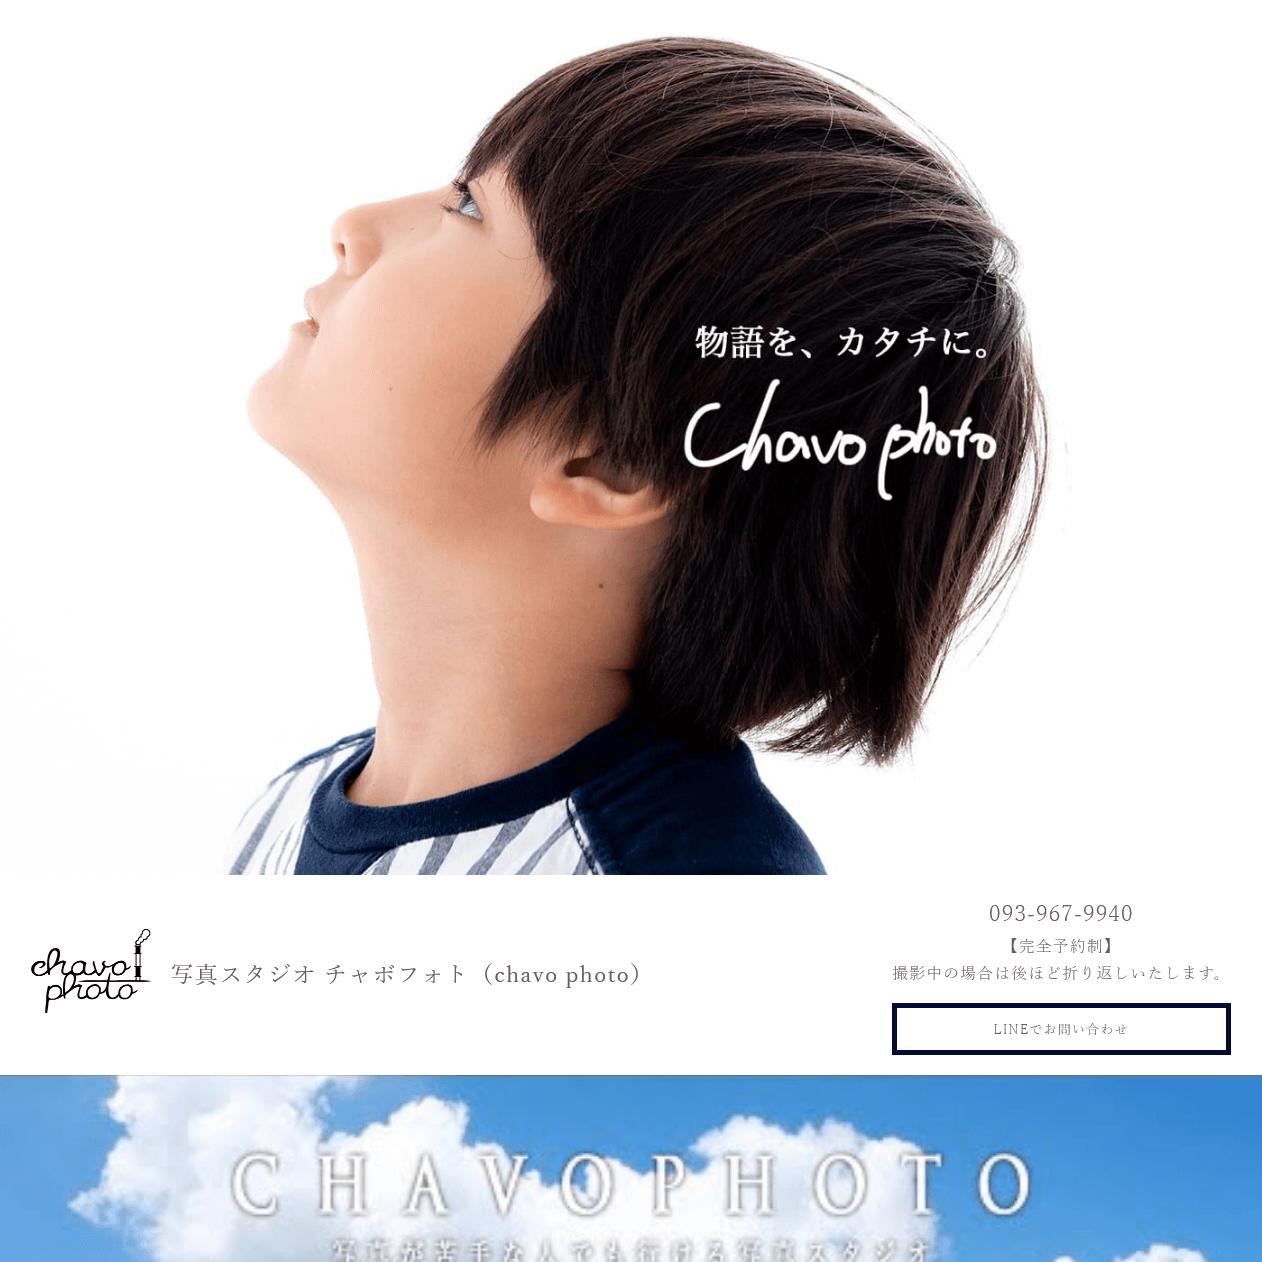 "<span class=""title"">写真スタジオ チャボフォトの口コミや評判</span>"